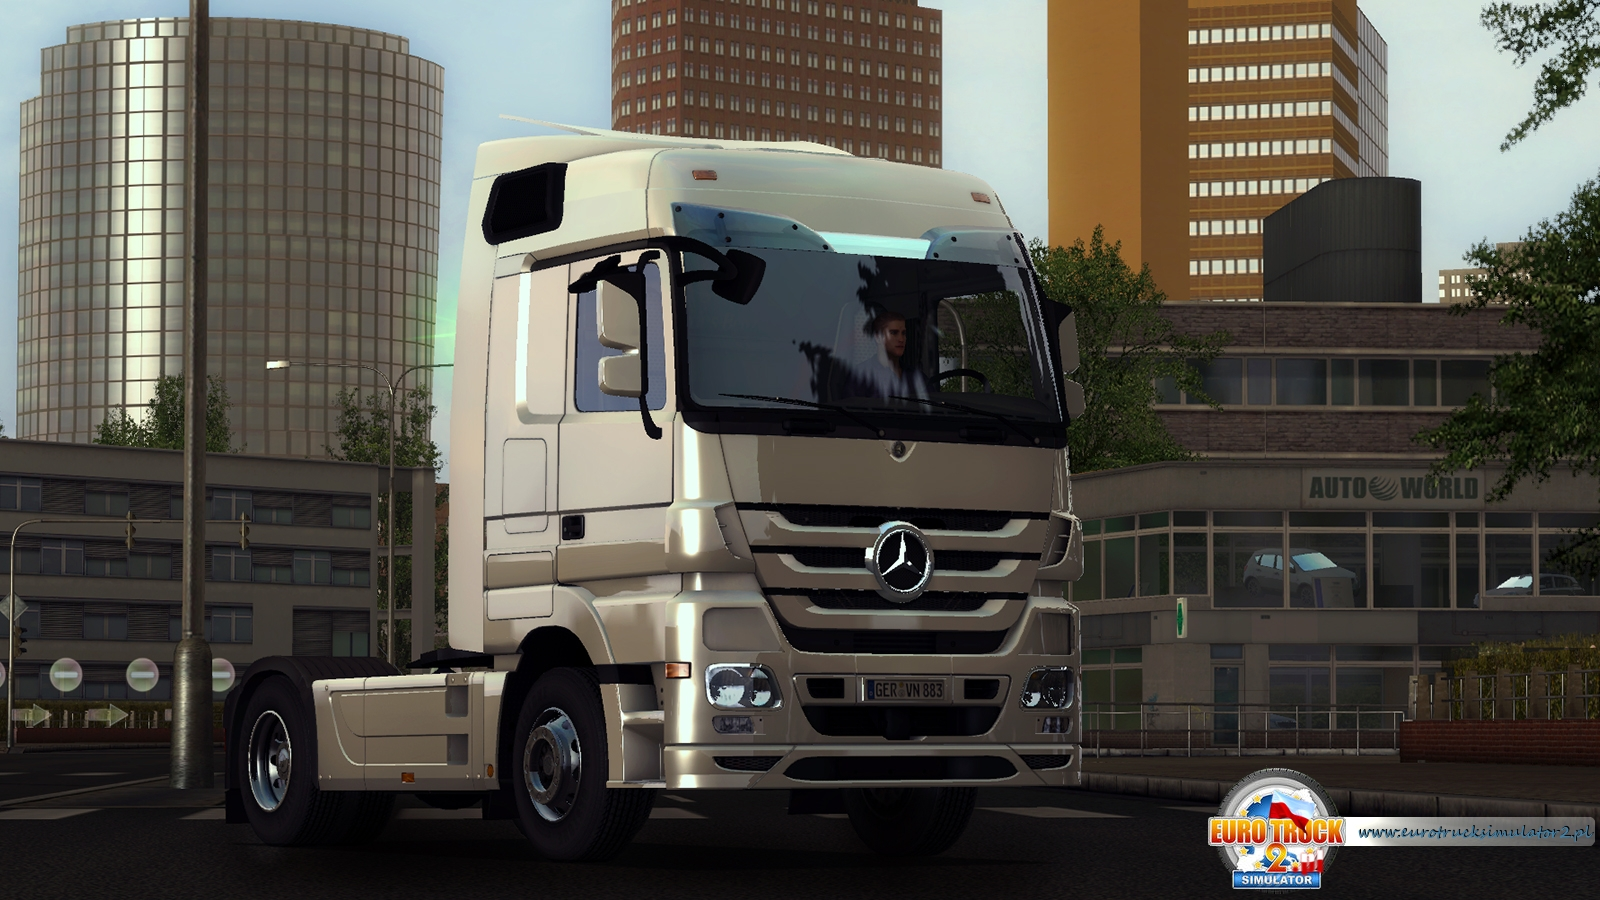 Mercedes Actros 2